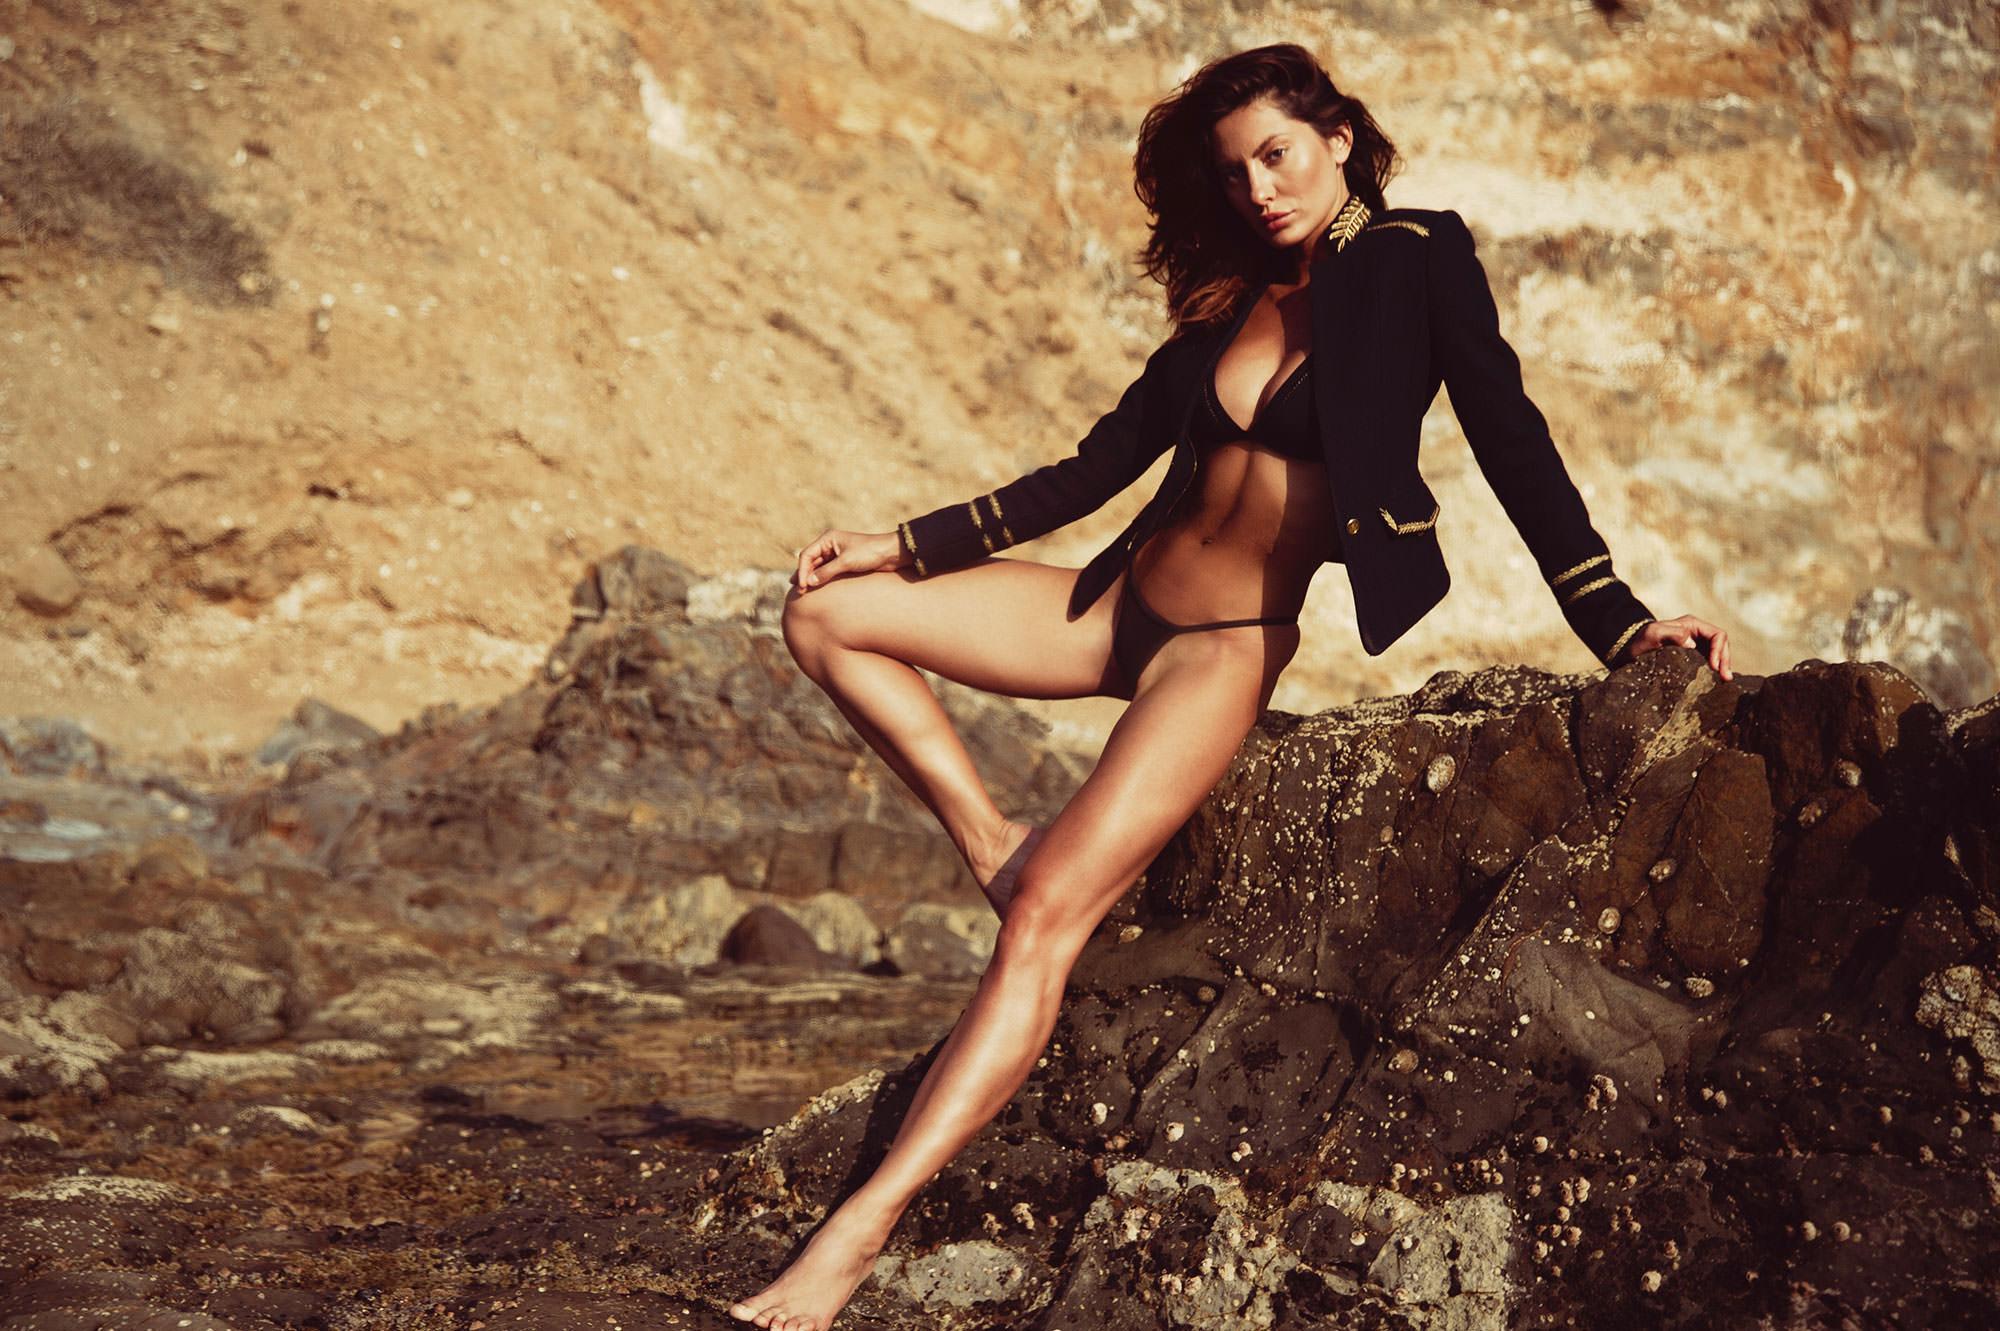 oksana-rykova-by-the-sea-in-swimwear.jpg